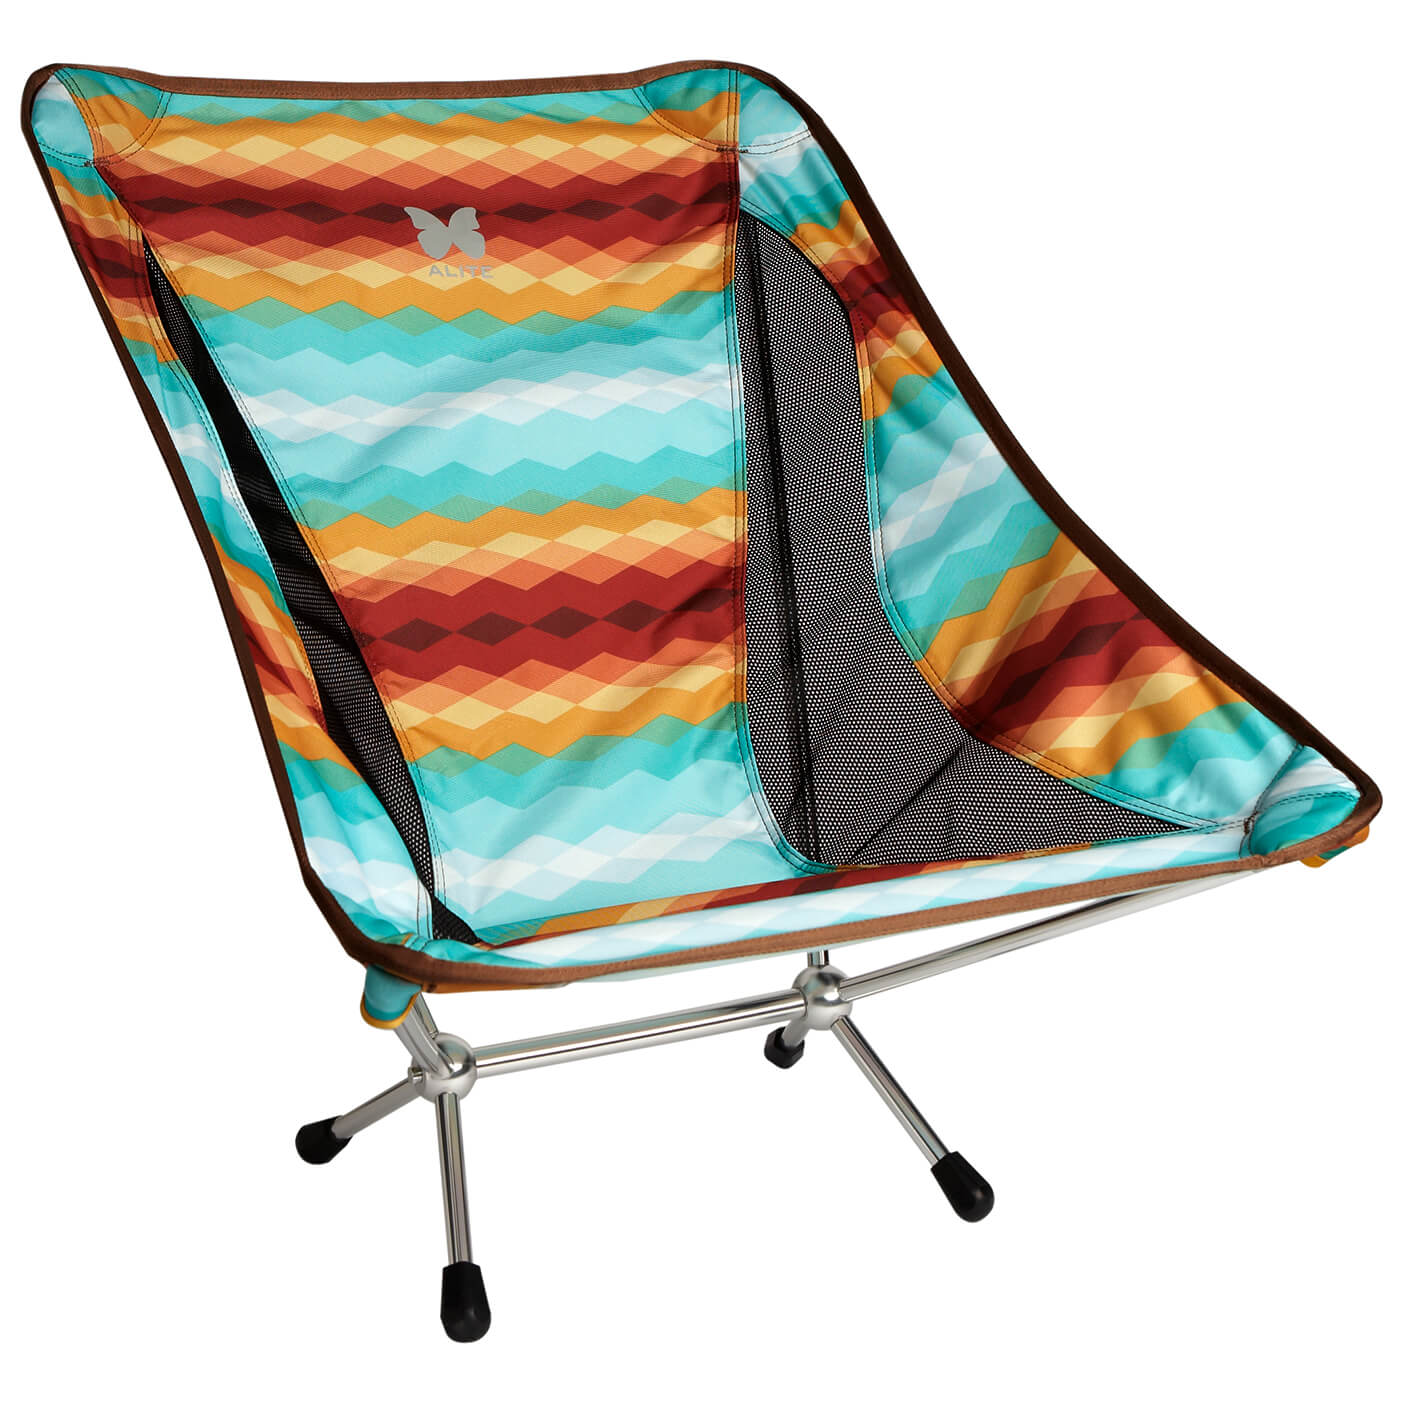 alite mantis chair office visitor chairs 2 campingstuhl versandkostenfrei